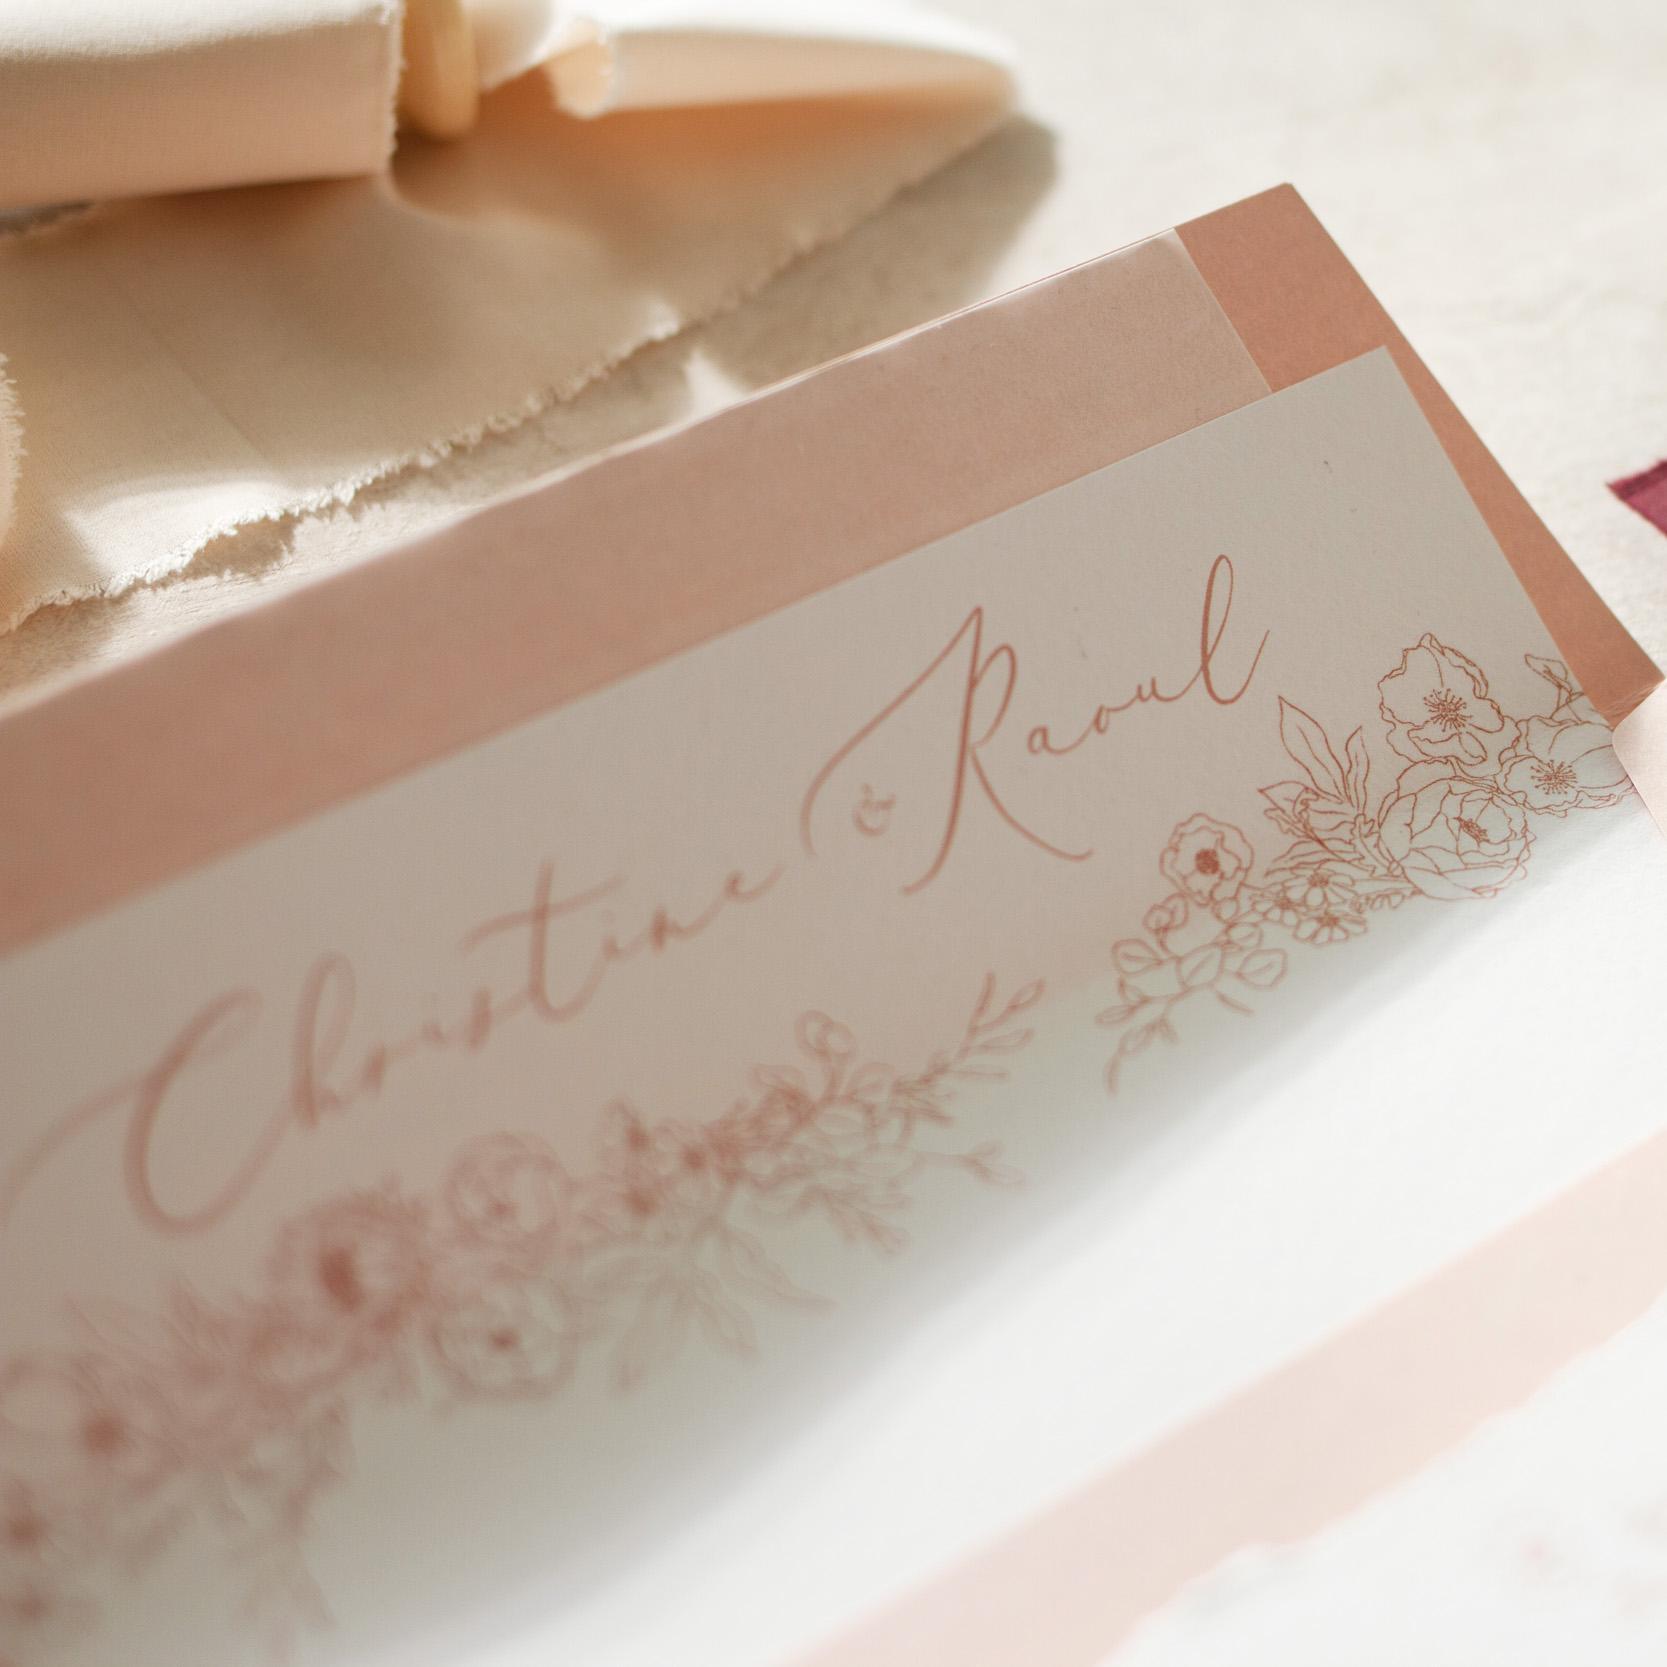 Blush Petals Blush Pink Wedding Stationery with Luxury Envelopes - www.pinglepie.com.jpg